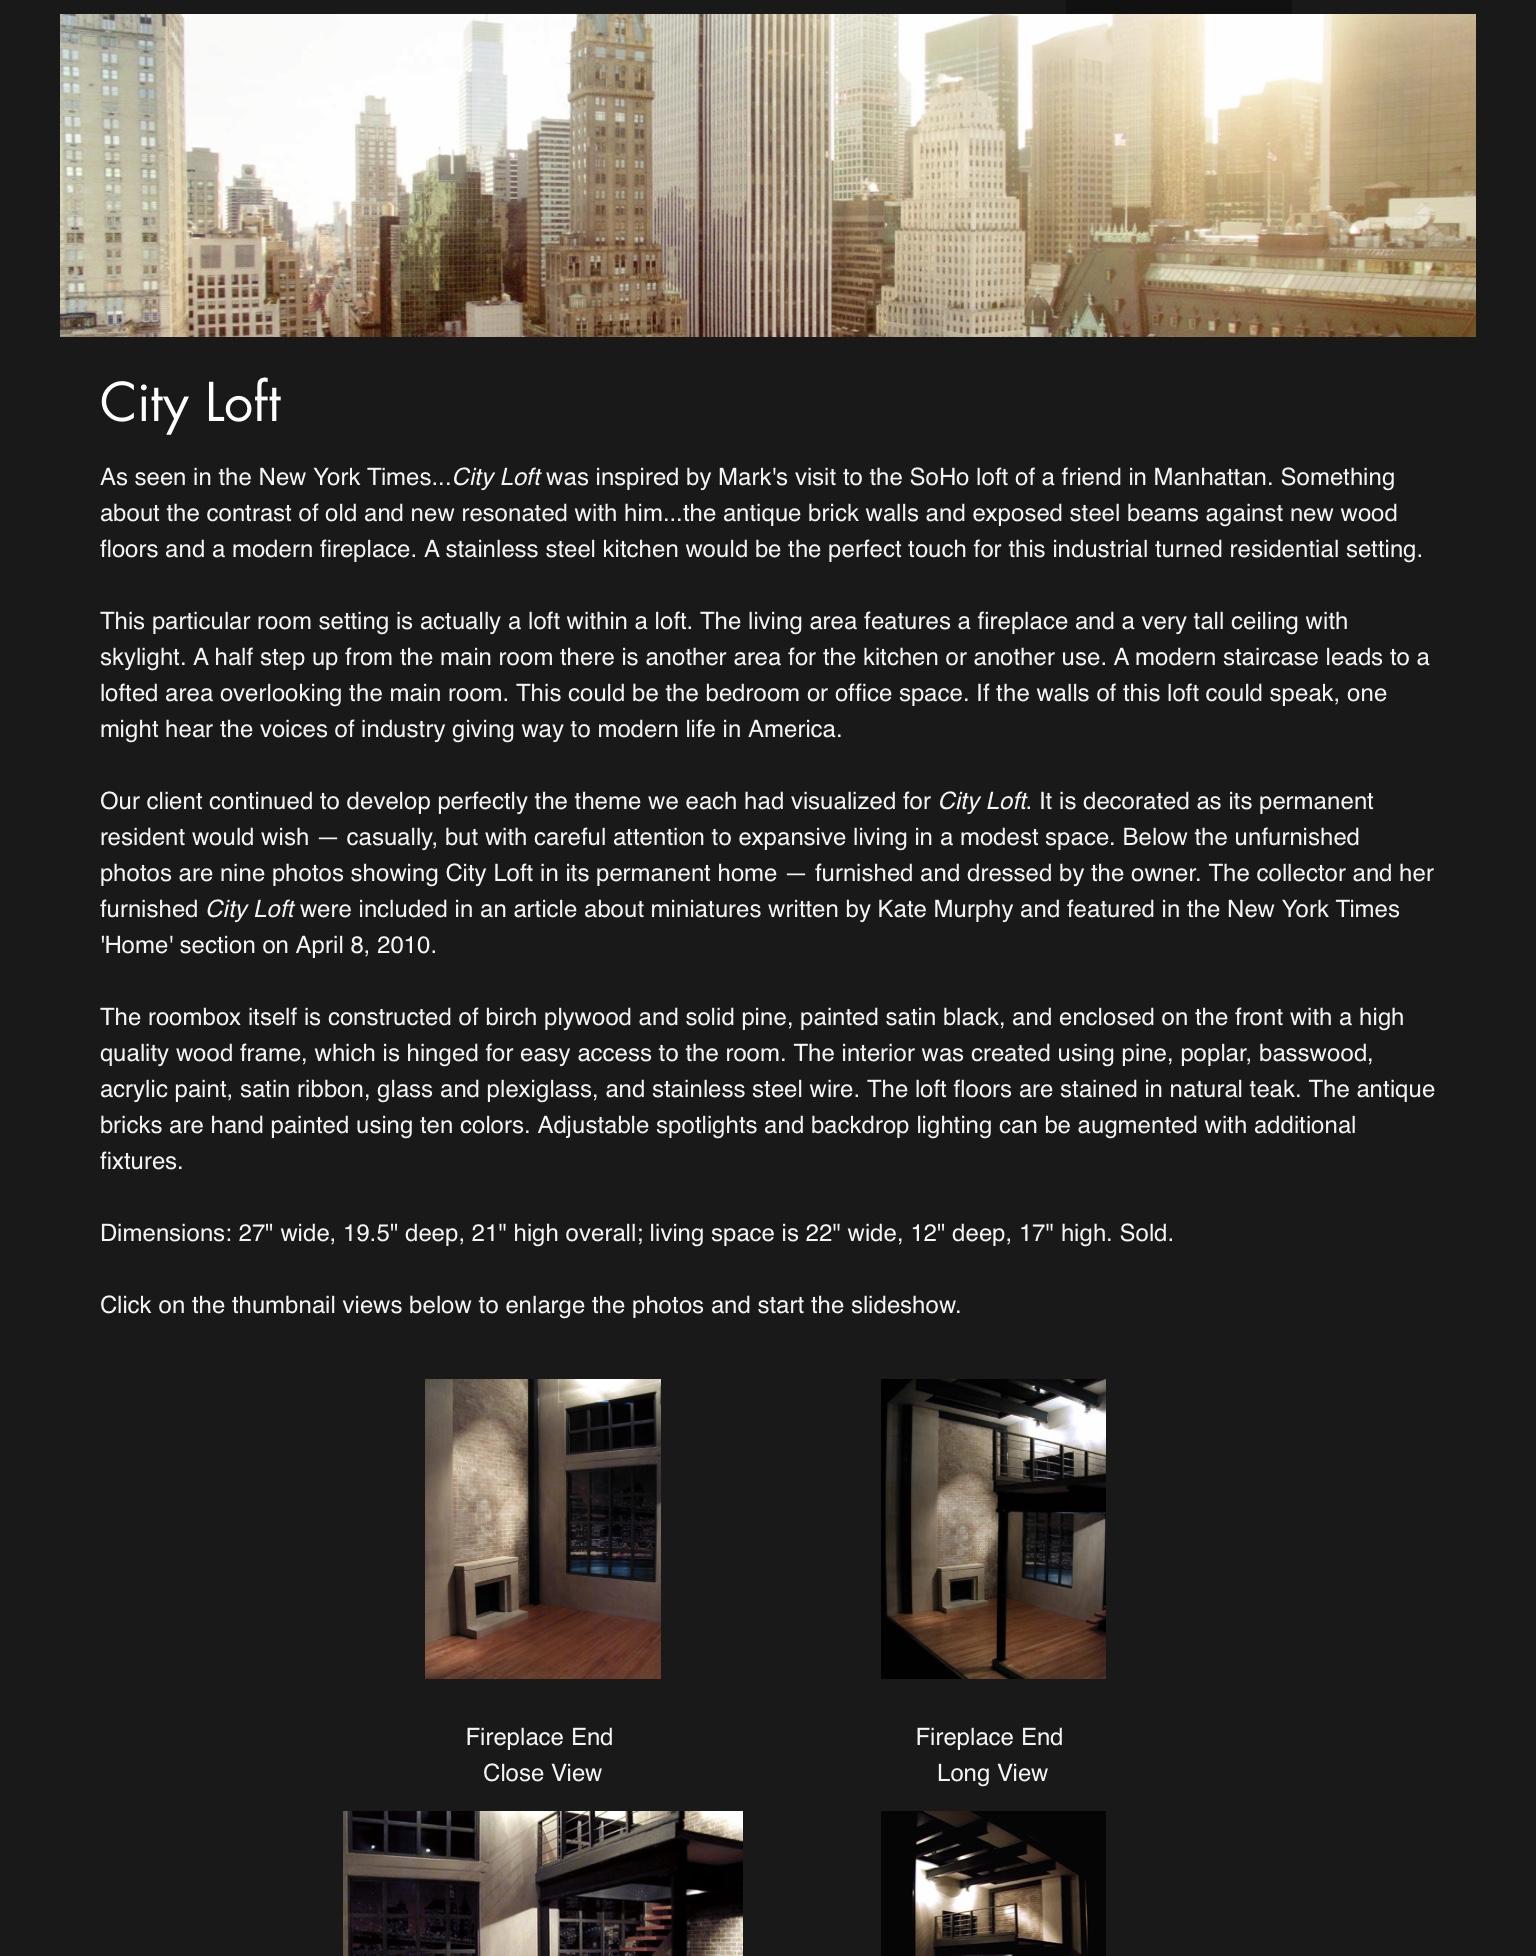 City Loft — 2003